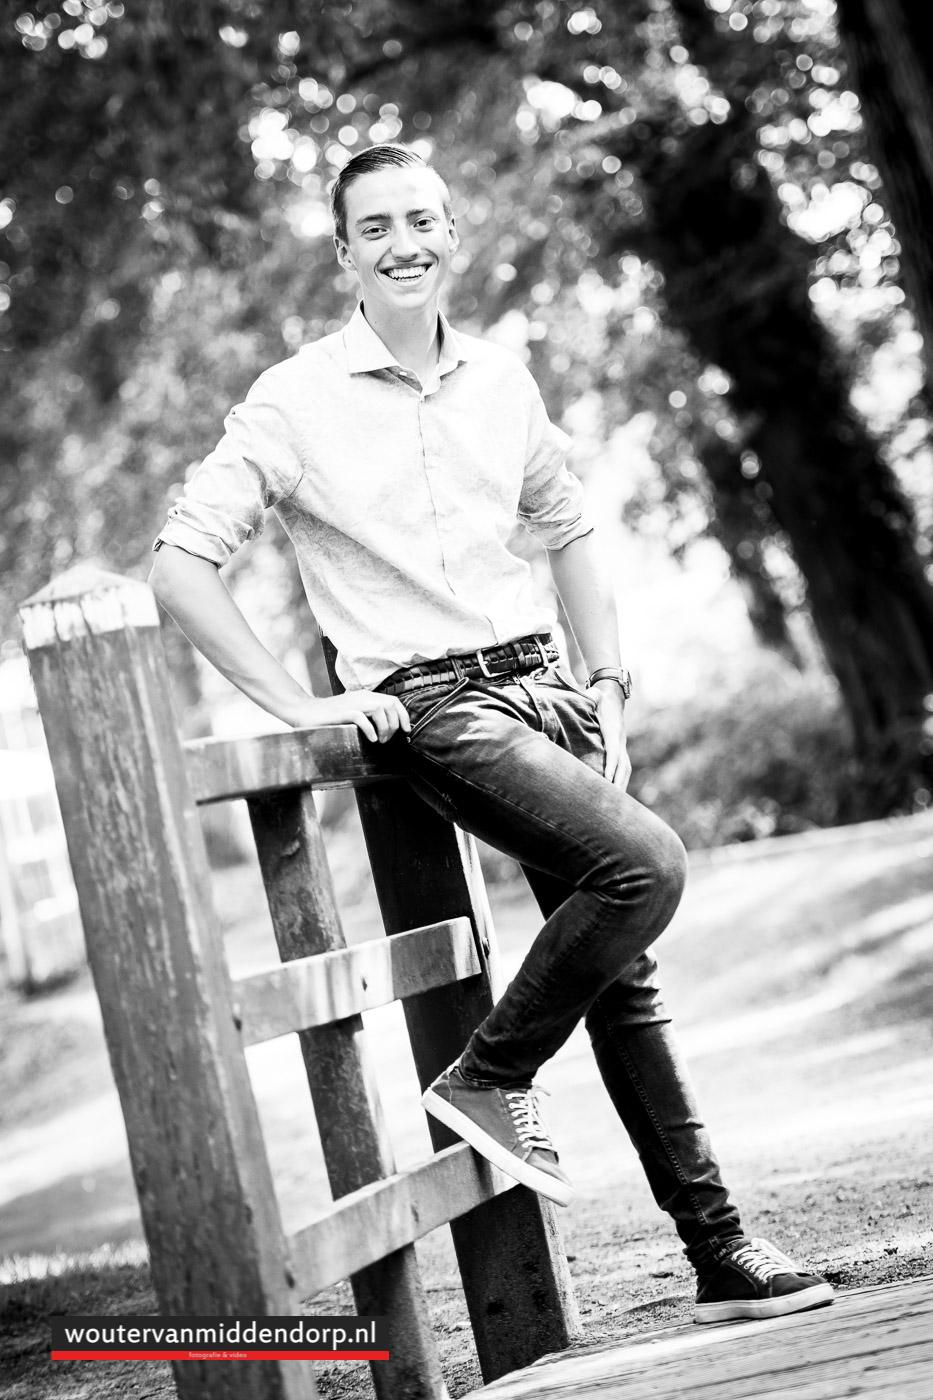 fotograaf Wouter van Middendorp Nunspeet-7